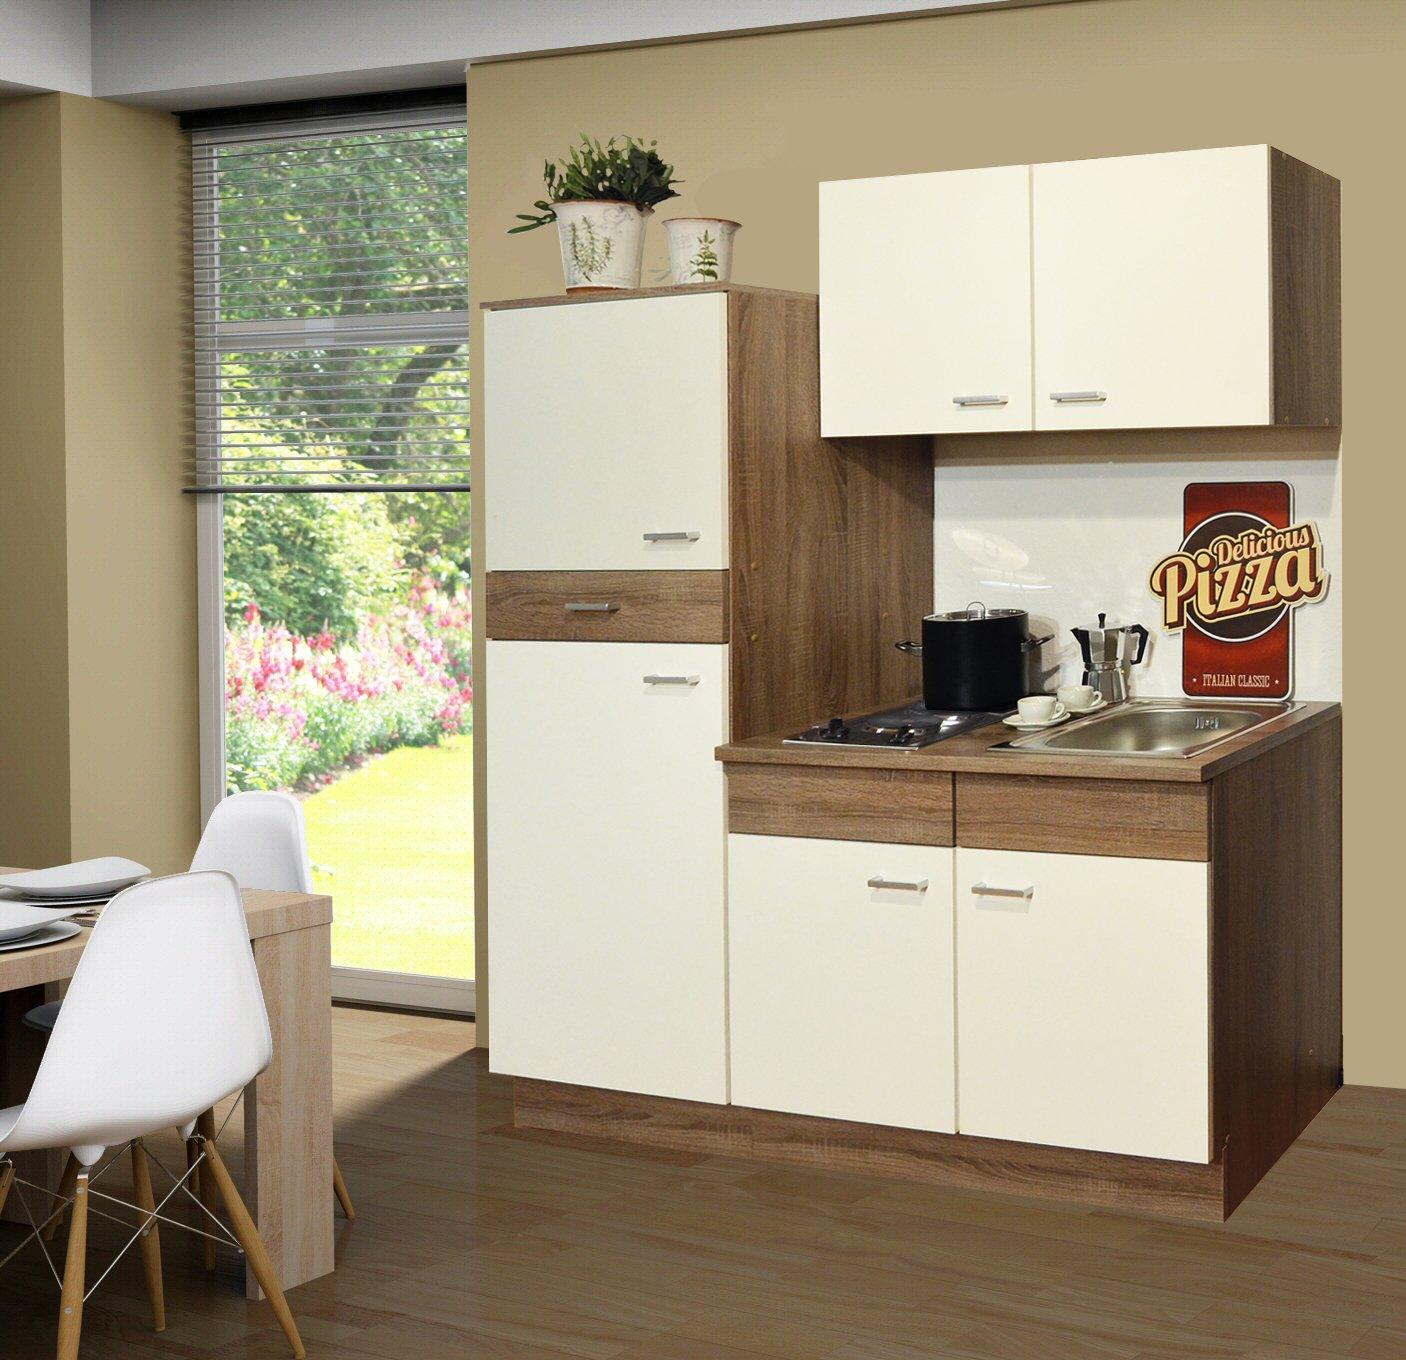 pantrykche obi kuche hochglanz inspiration weisse hochglanz kche weiss modernen kche wei welche. Black Bedroom Furniture Sets. Home Design Ideas